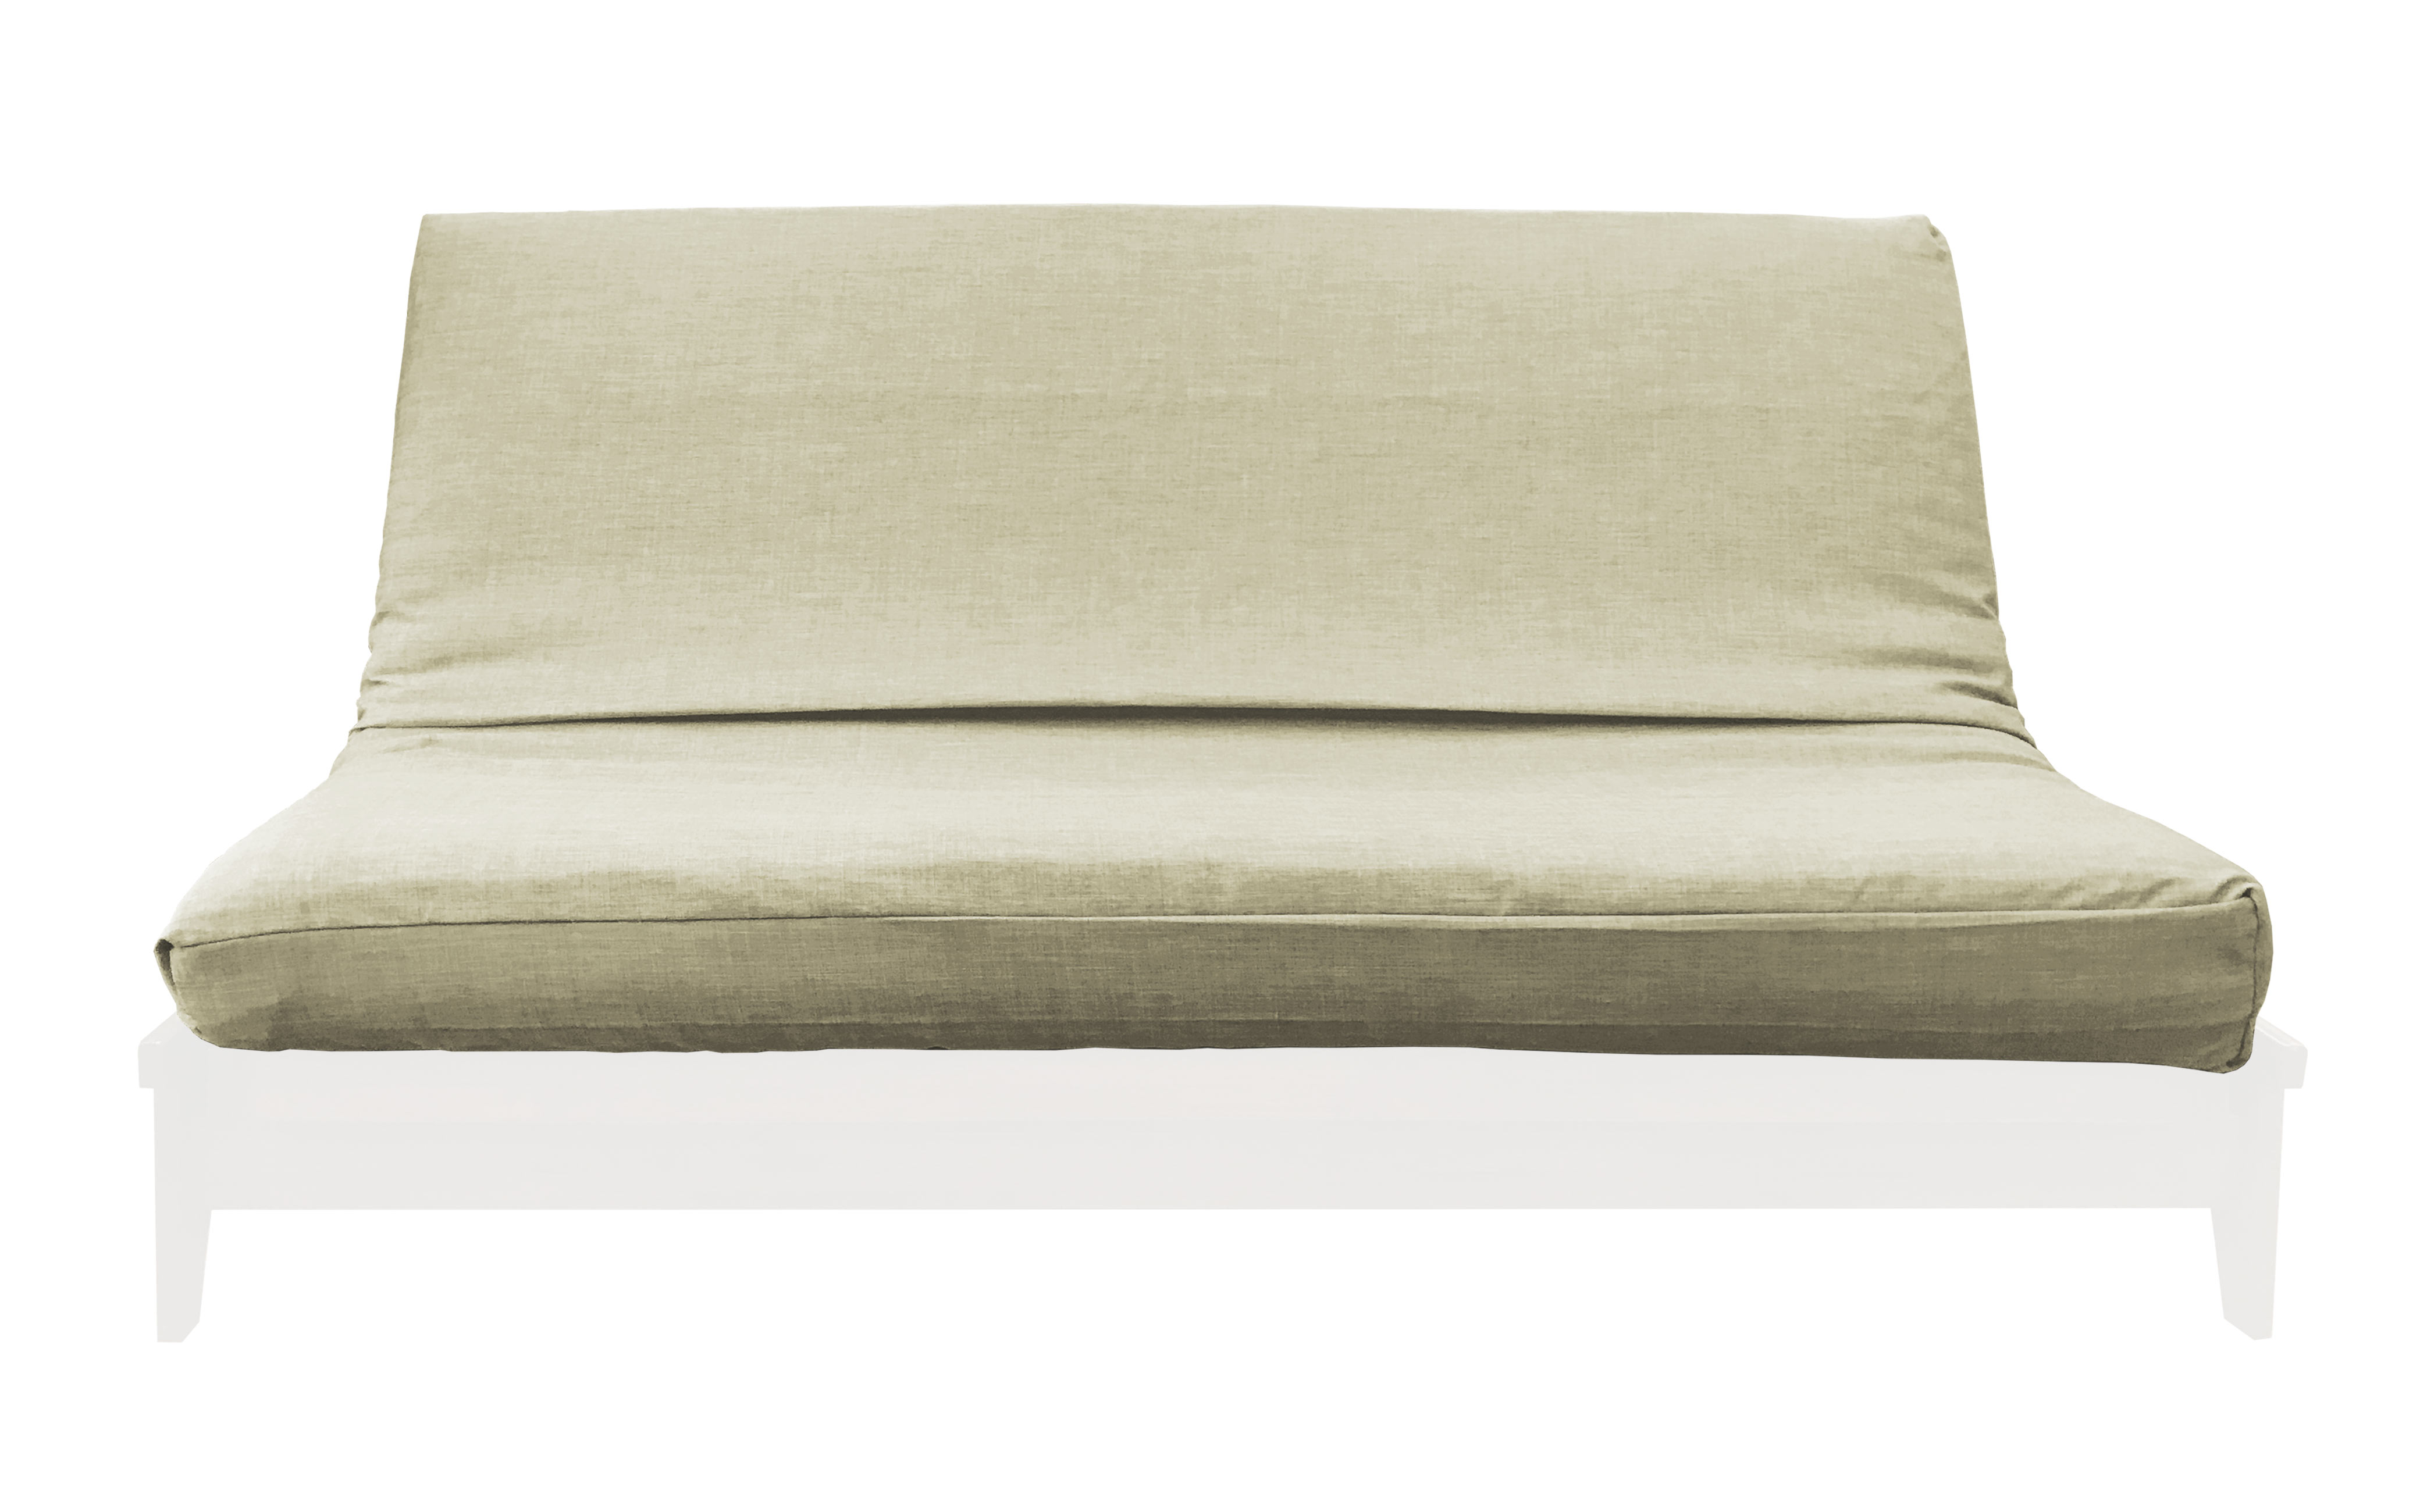 Medley Burlap Linen Texture Futon Cover